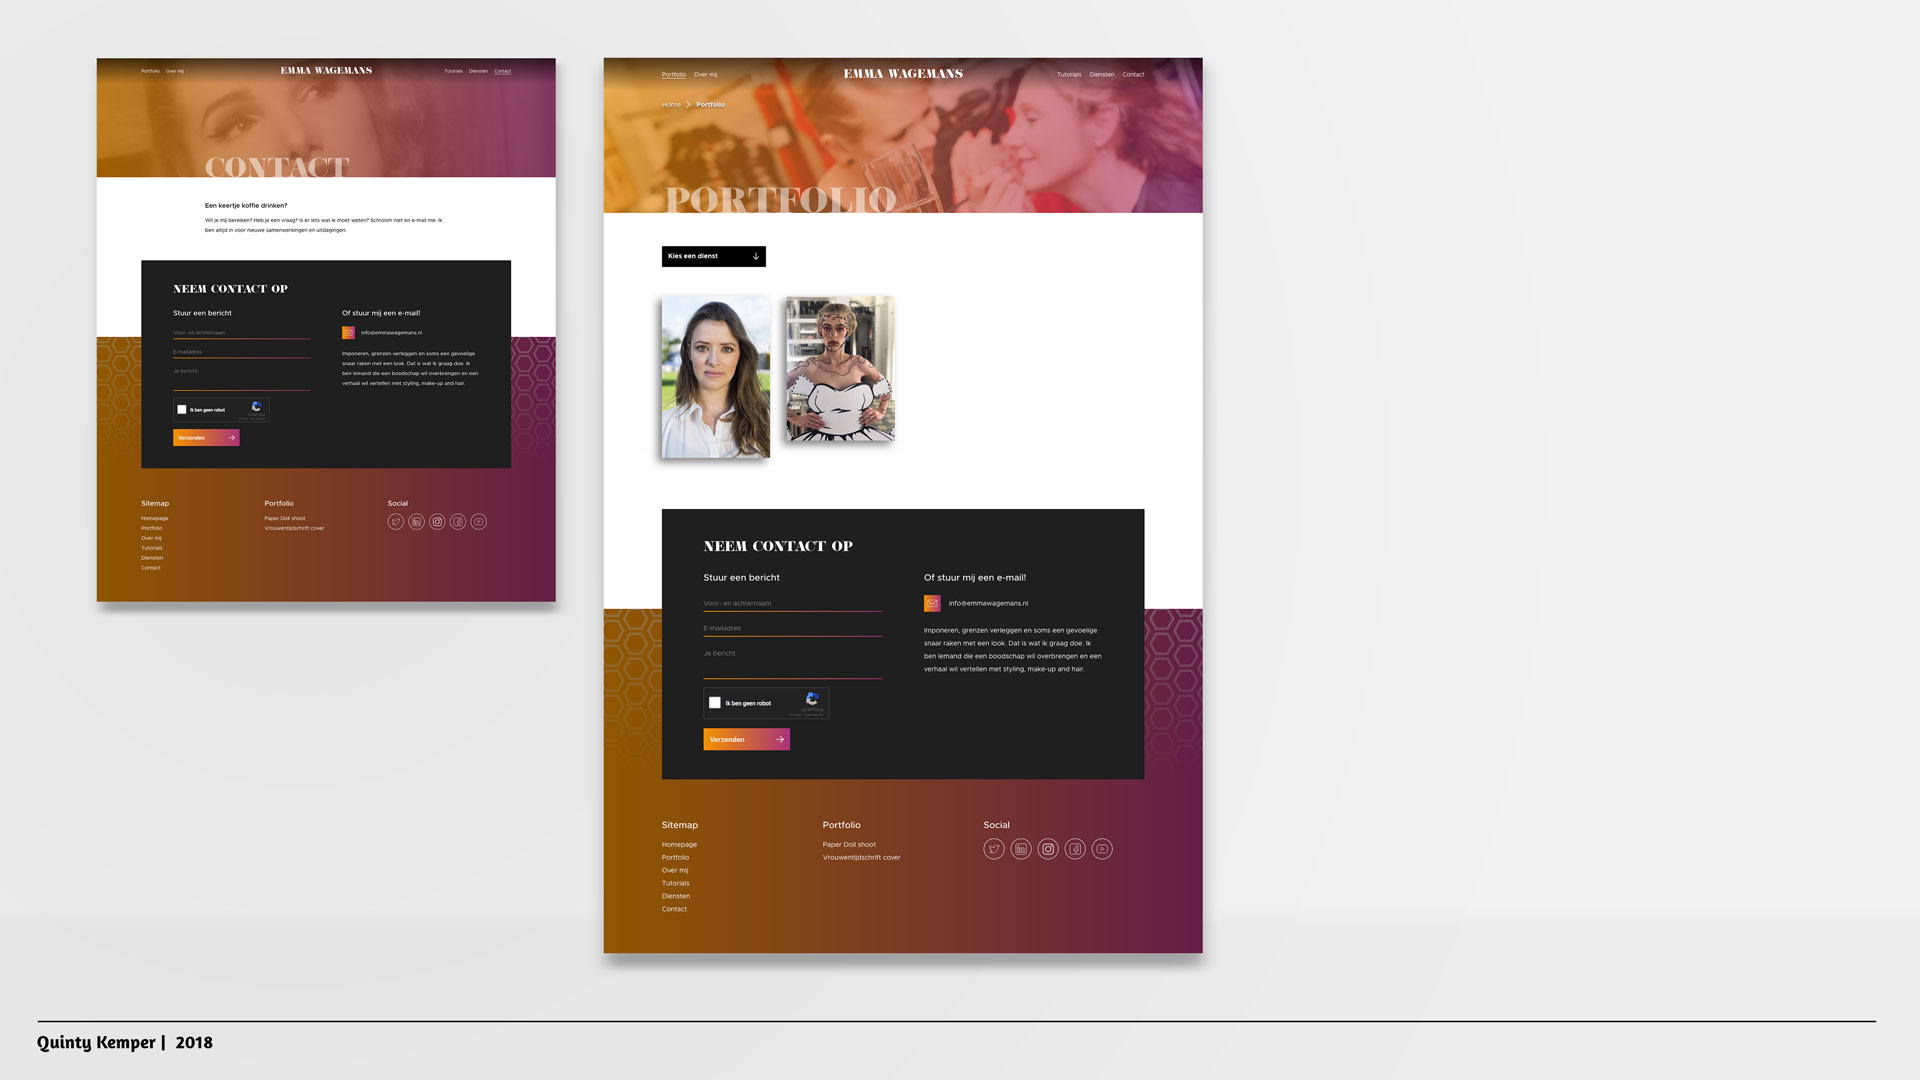 Quinty Kemper Portfolio 2018 Portfolio website Emma Wagemans pagina's